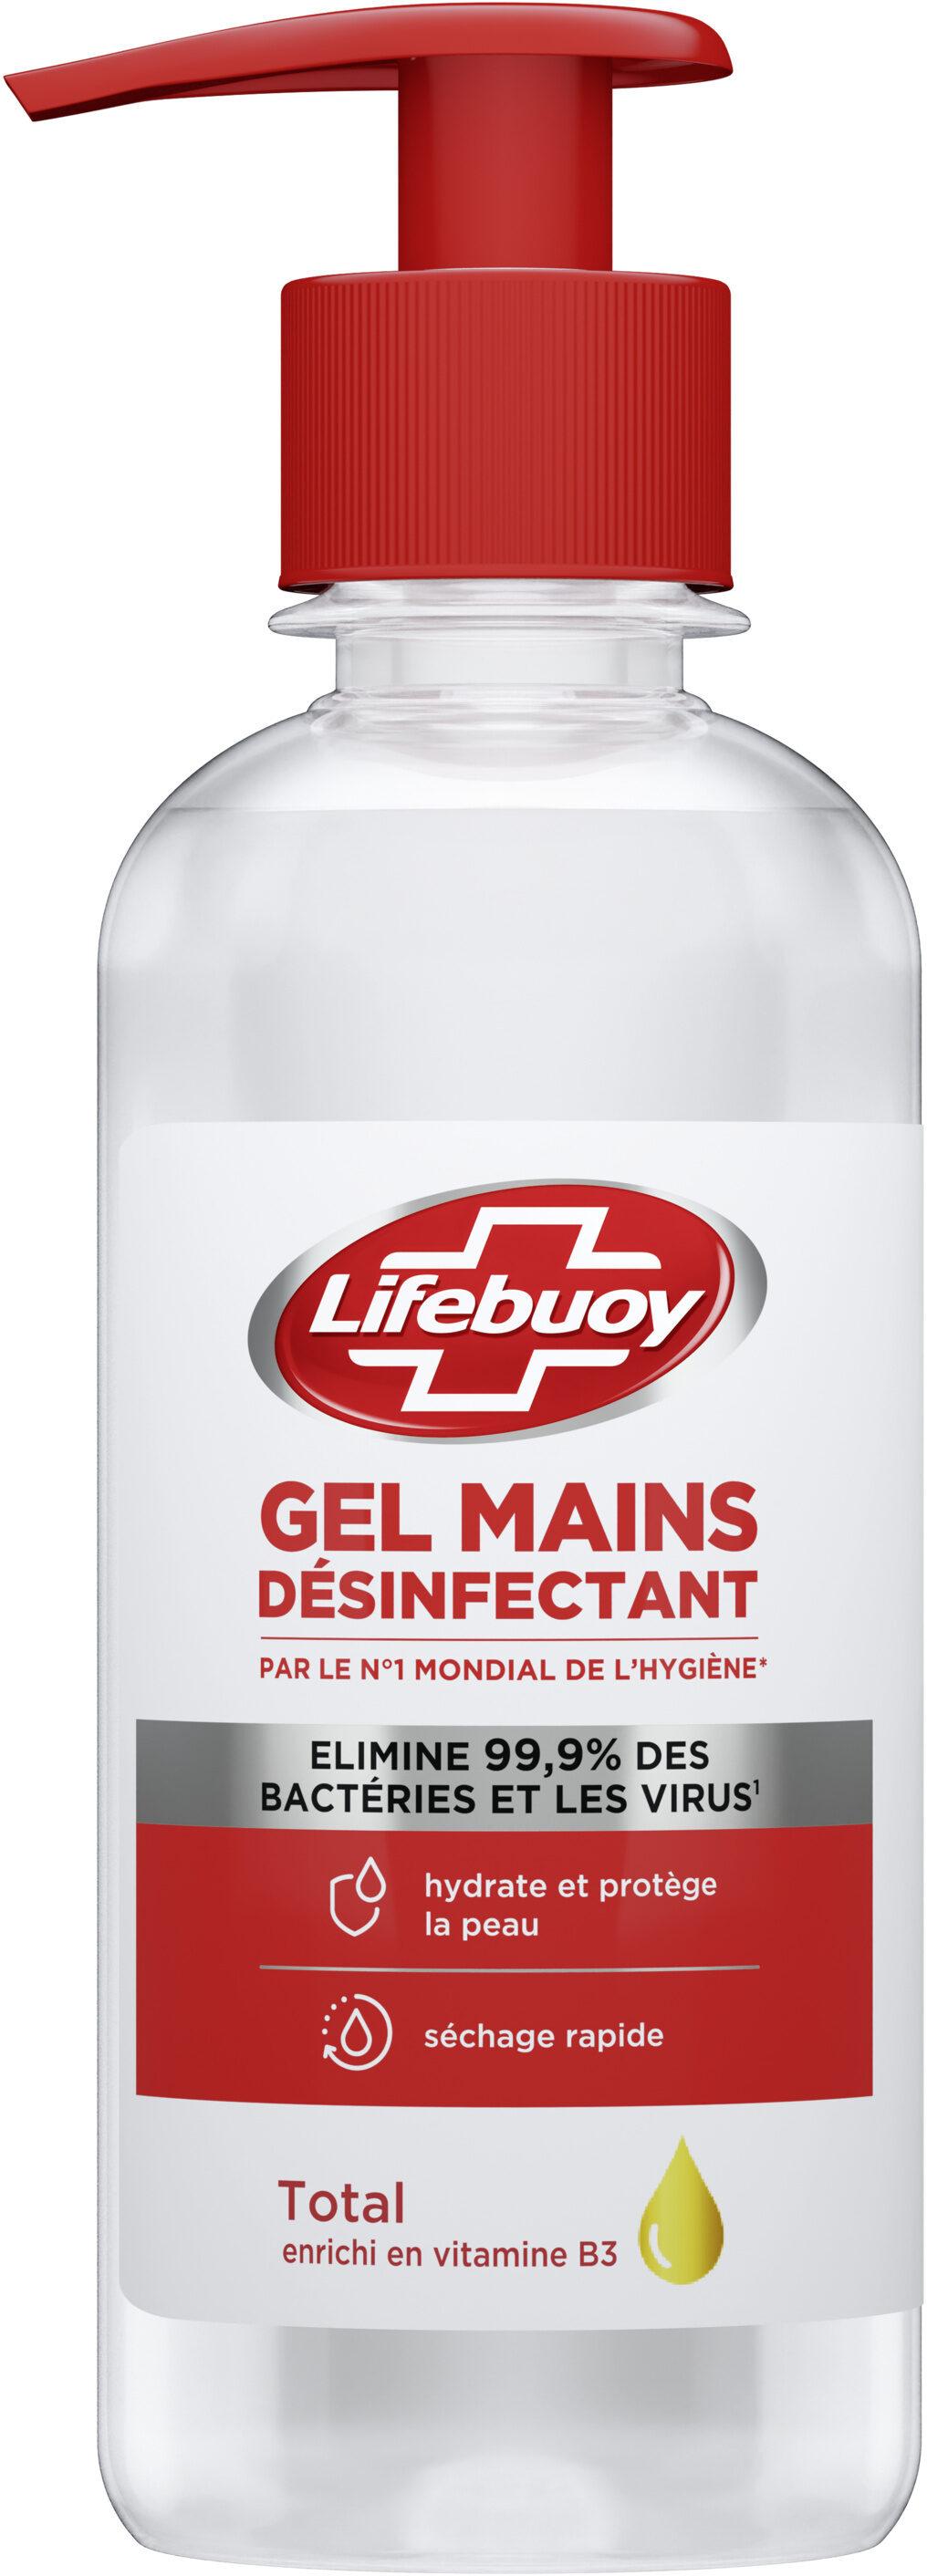 Lifebuoy Gel Hydroalcoolique Mains Pompe - Product - fr